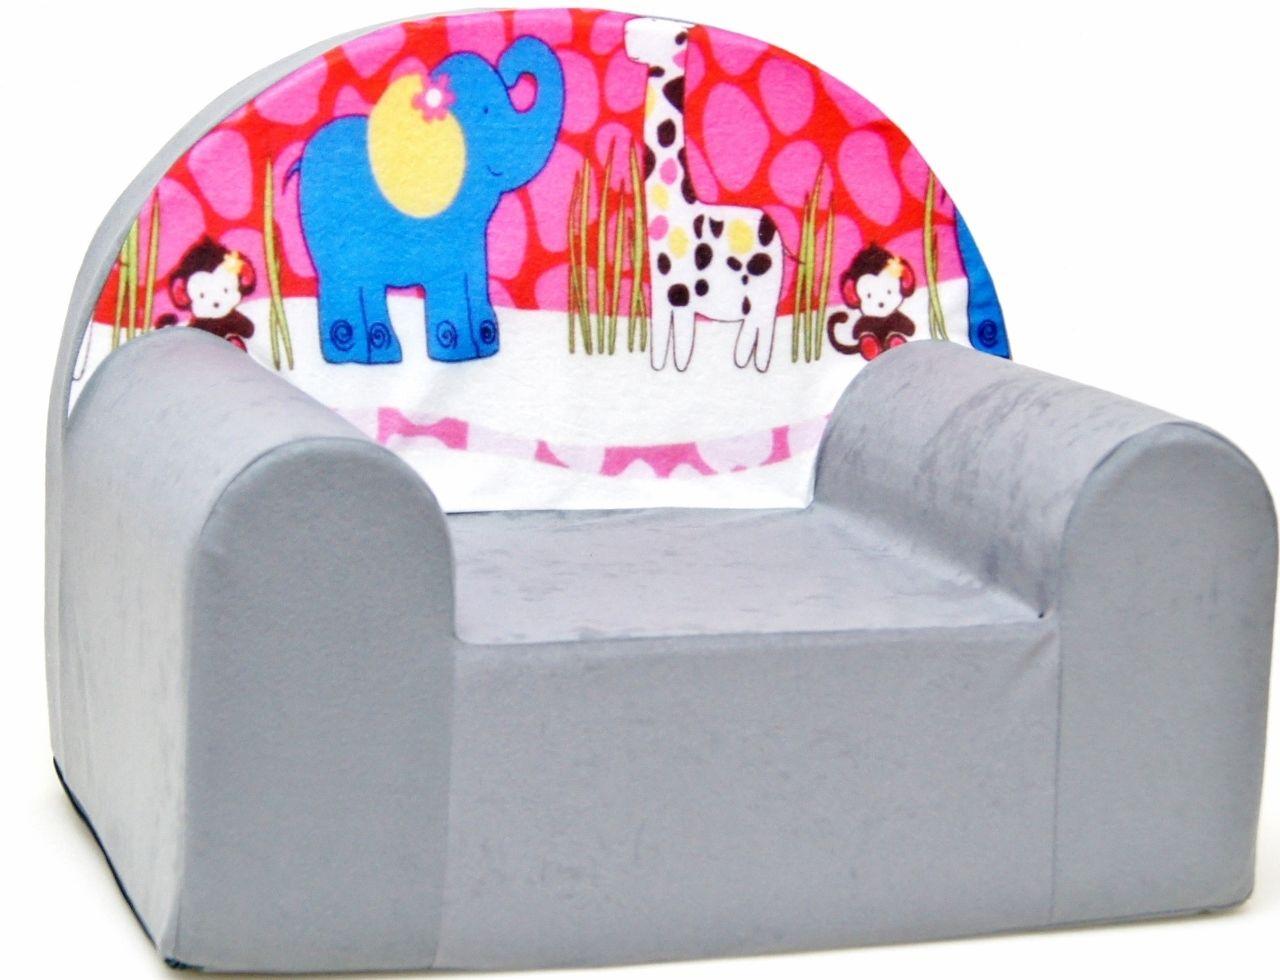 Children's Foam Armchair type W wfa16